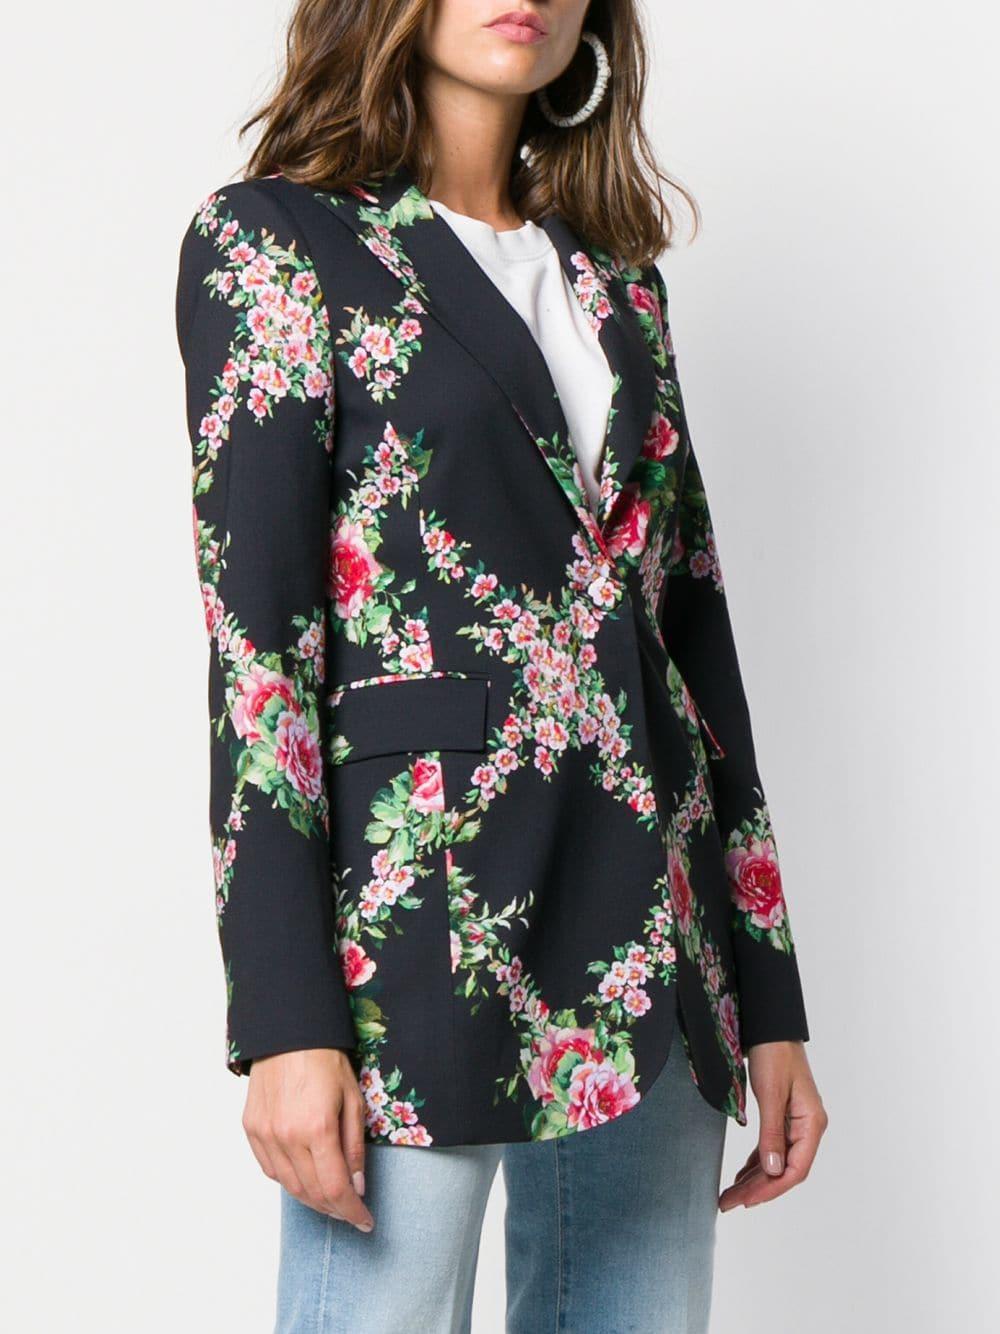 462873d2c Blumarine Floral Print Longline Blazer in Black - Lyst